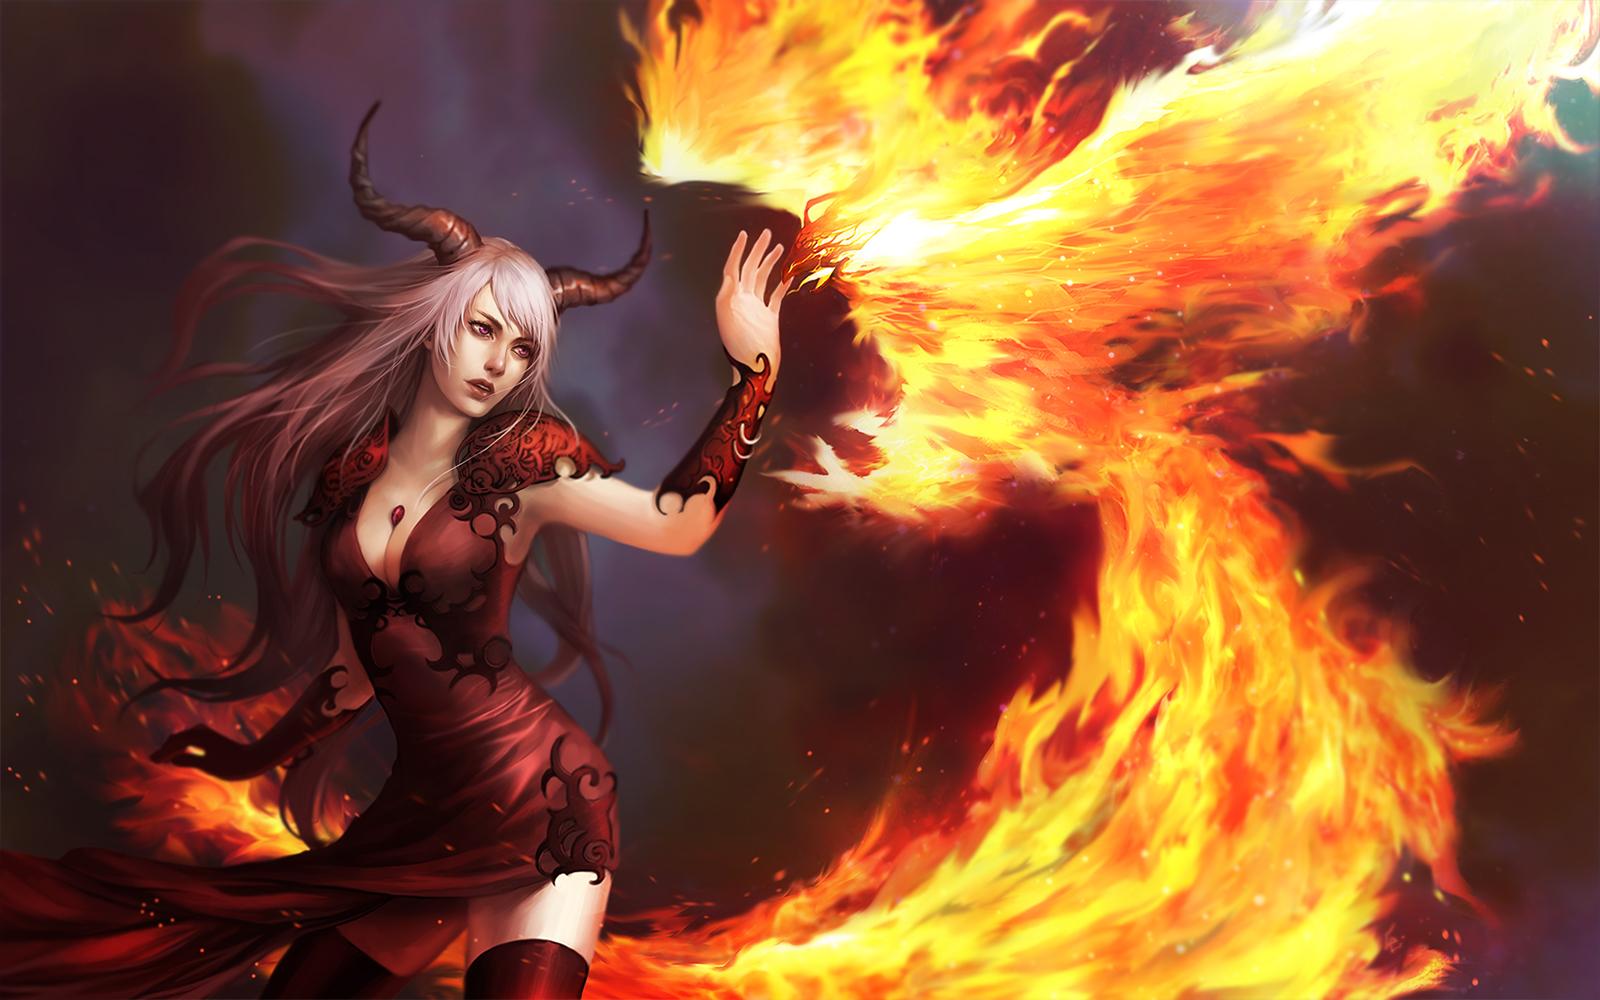 Phoenix_Demoness by Unodu